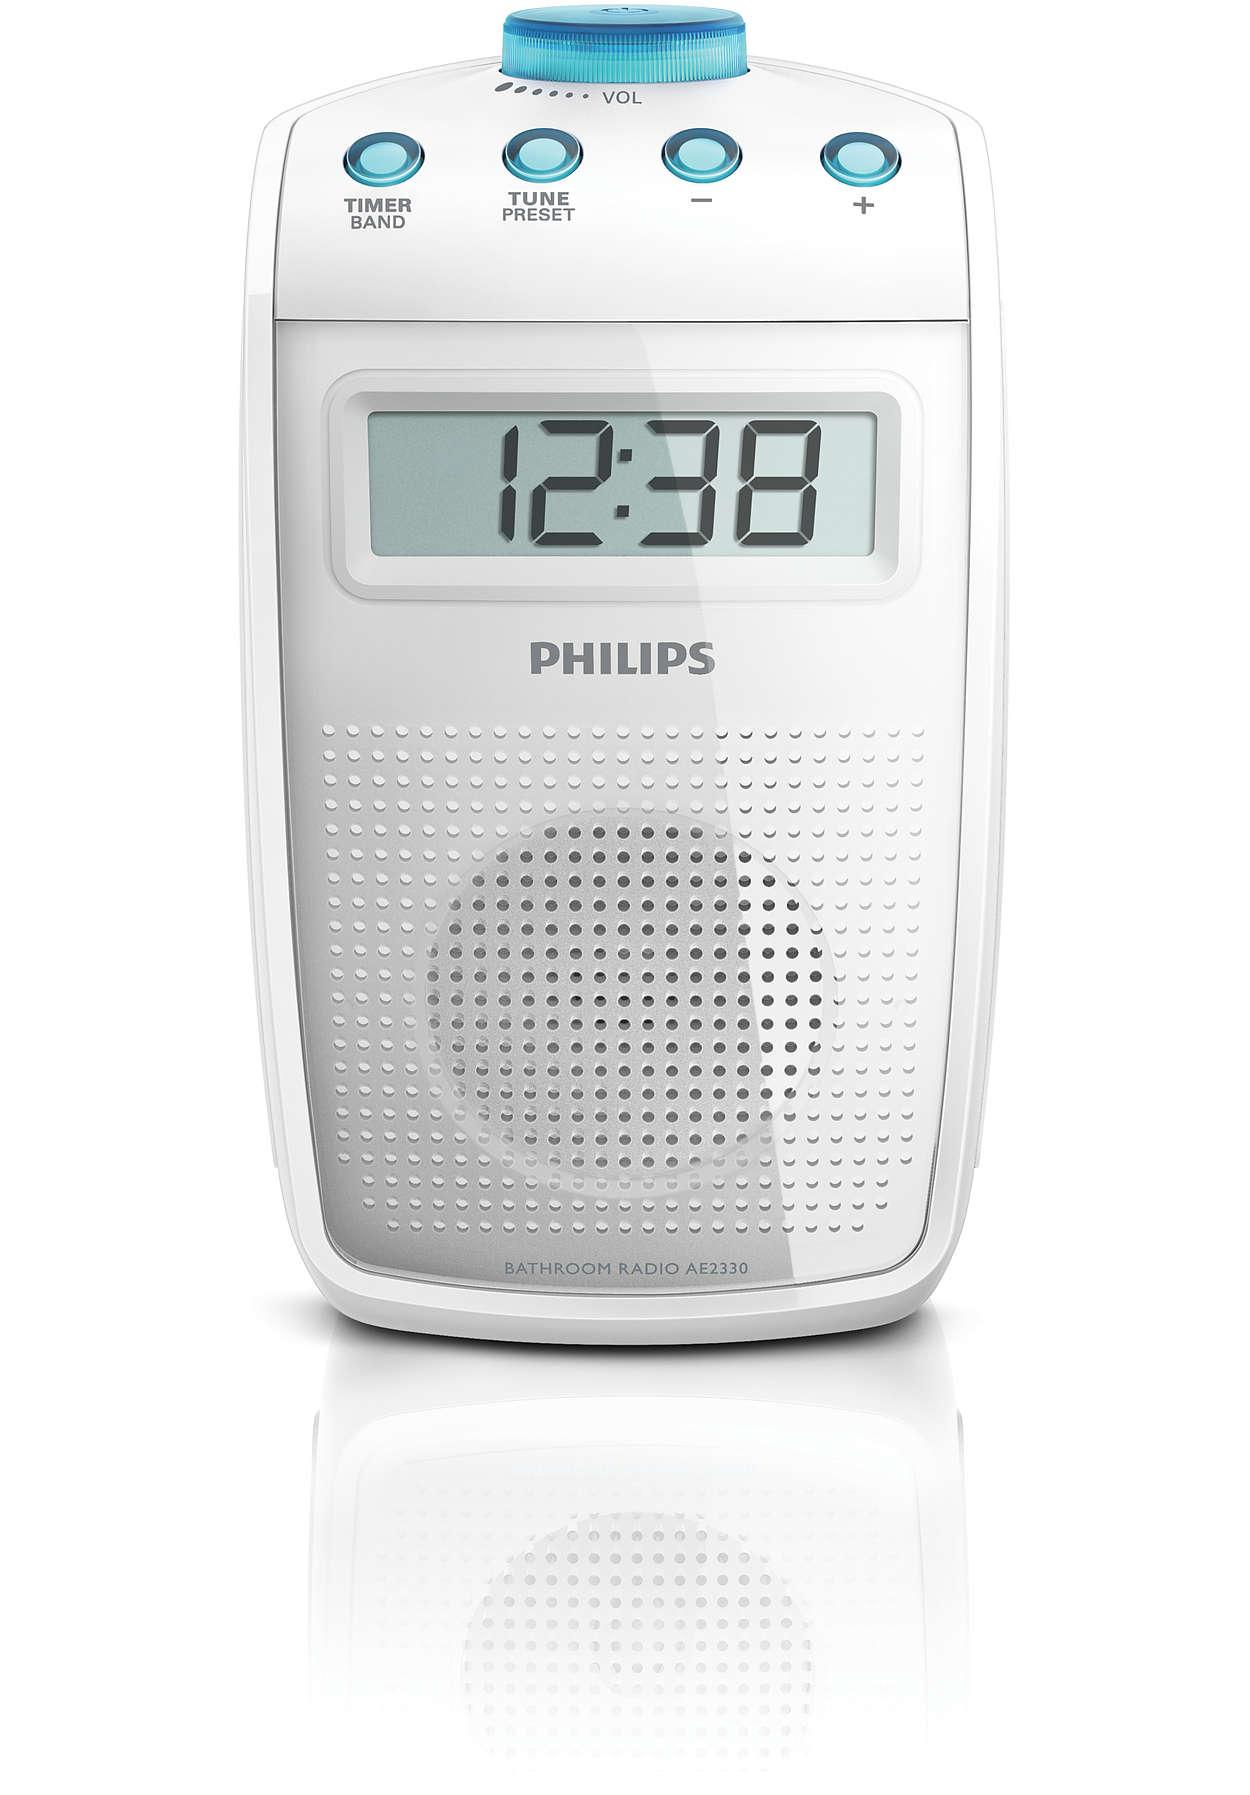 Badkamerradio AE2330/00 | Philips